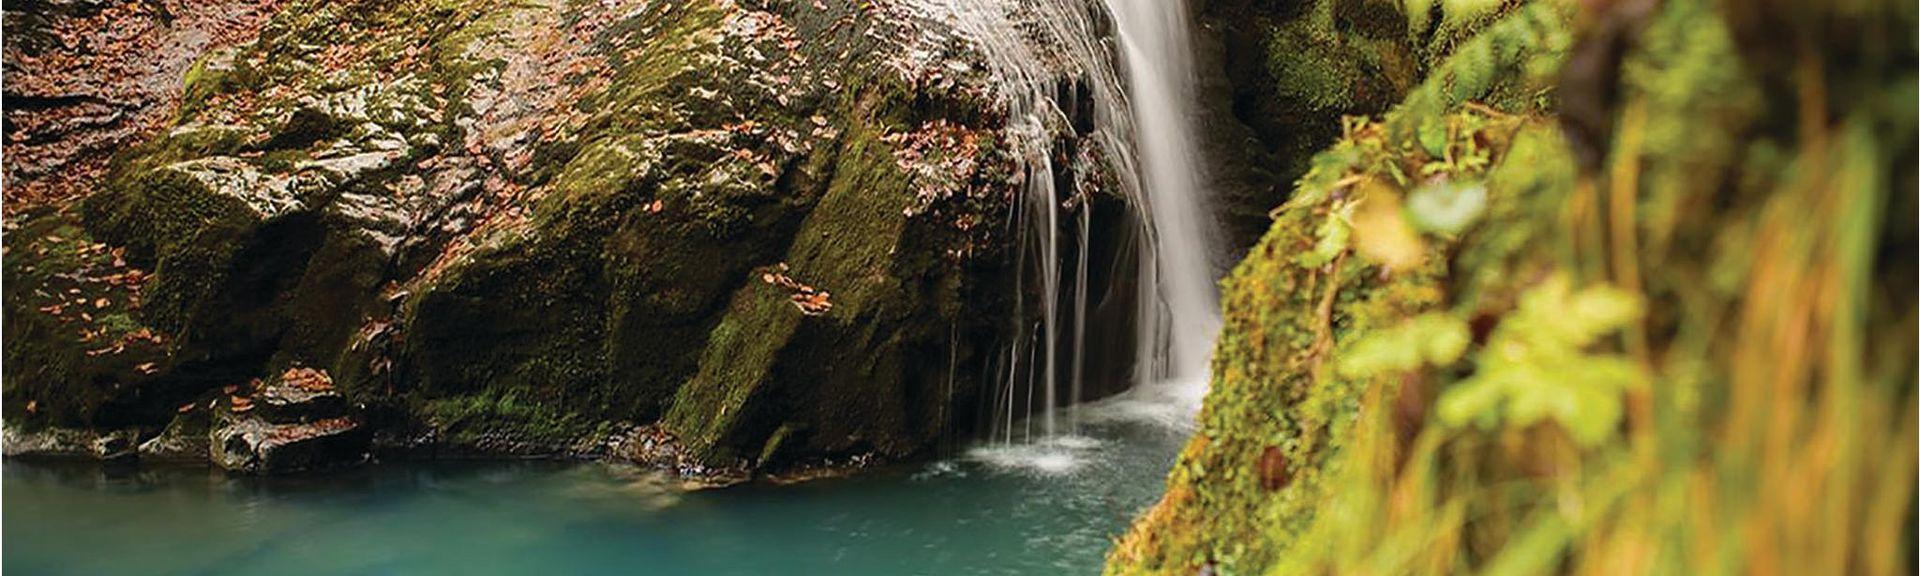 Żupania primorsko-gorska, Chorwacja